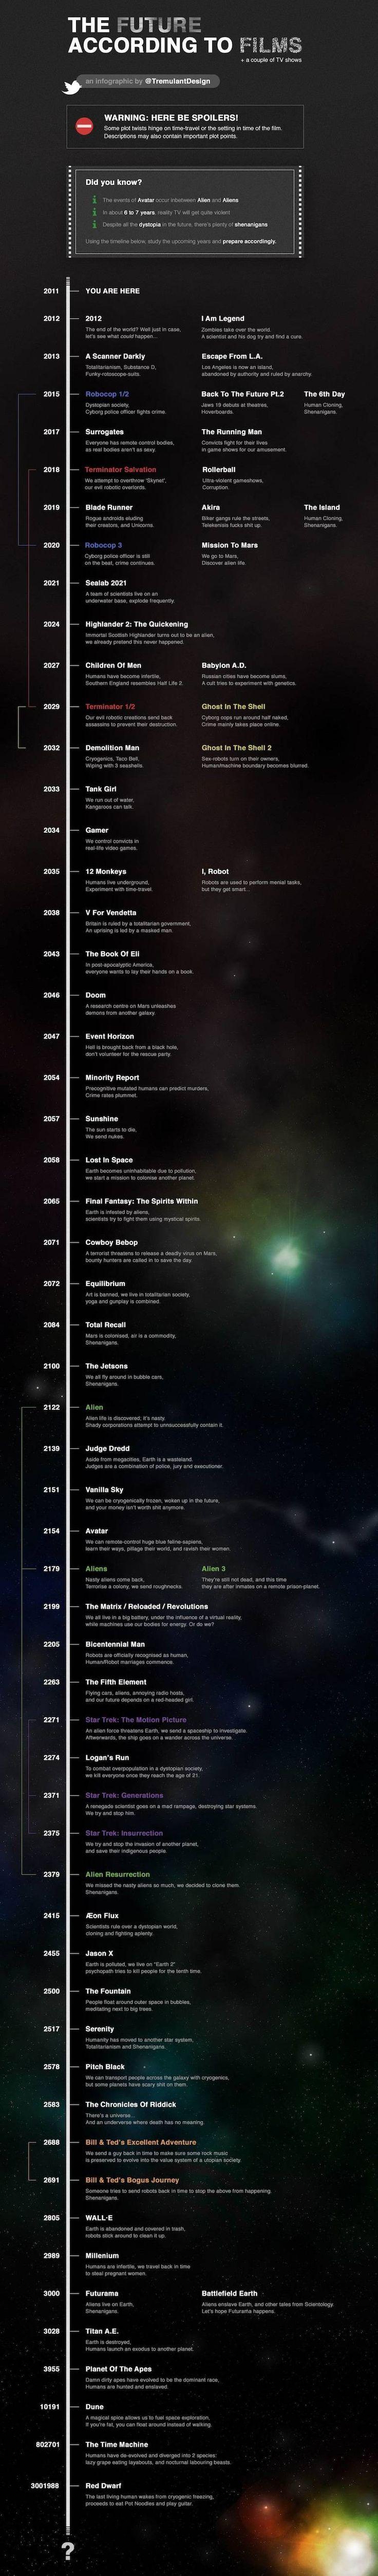 The future according to Sci-Fi